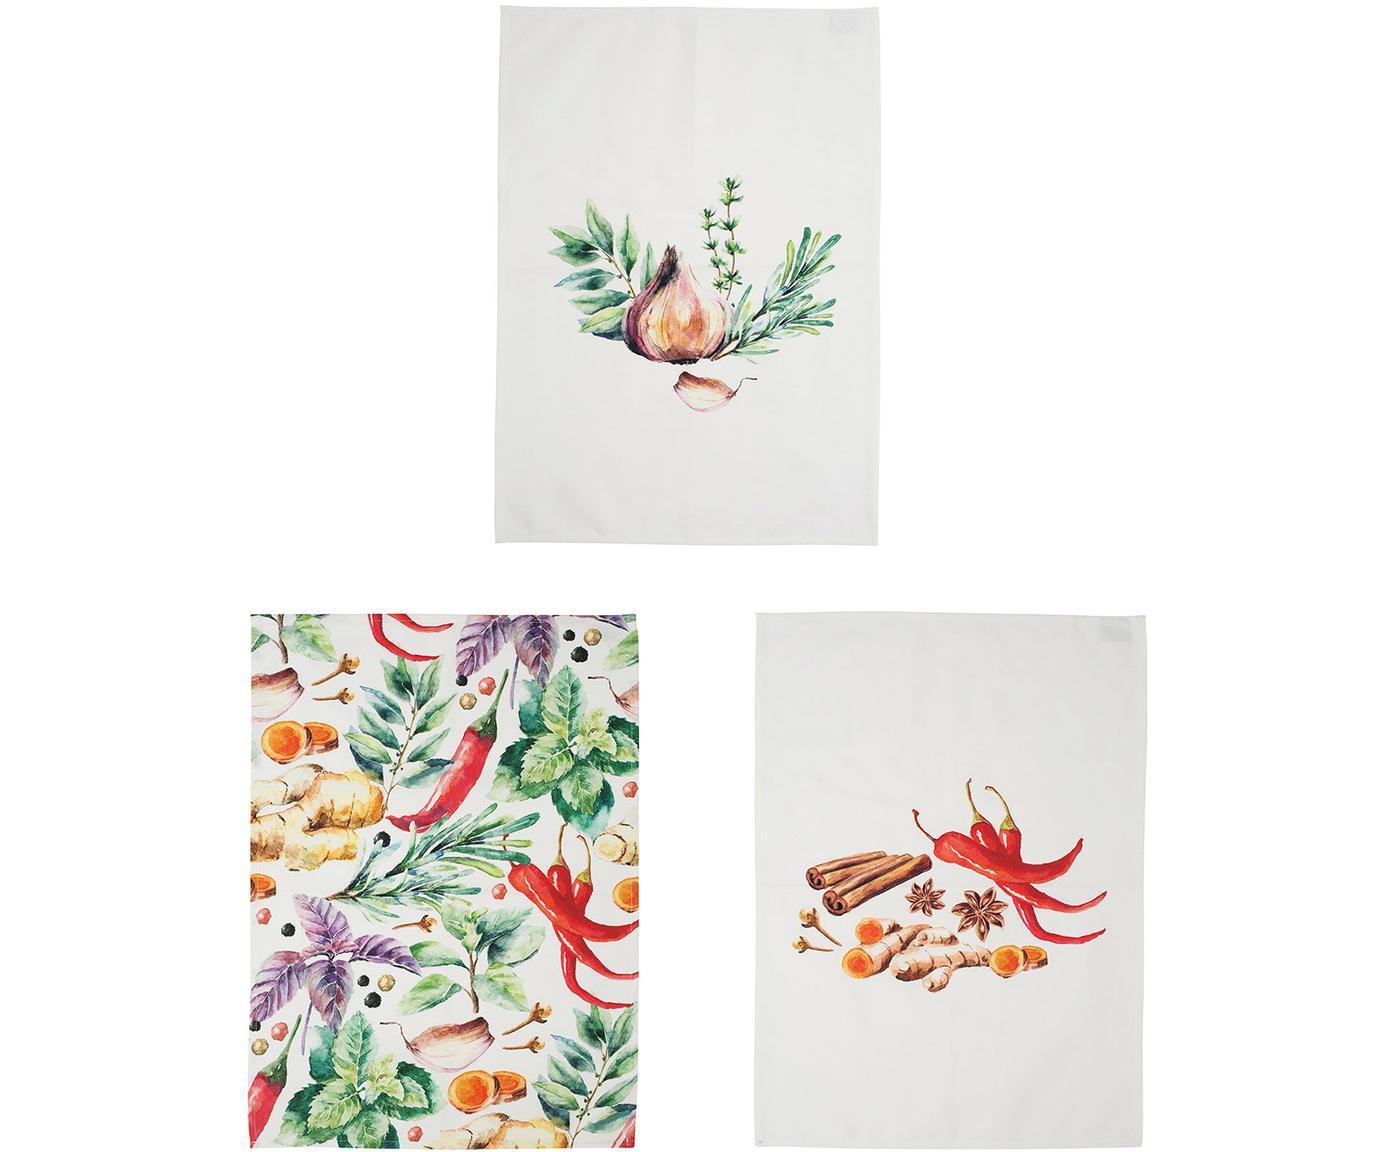 Geschirrtücher-Set Epices mit Gewürz-Motiven, 3-tlg., Baumwolle, Weiss, Grün, Rot, 50 x 70 cm